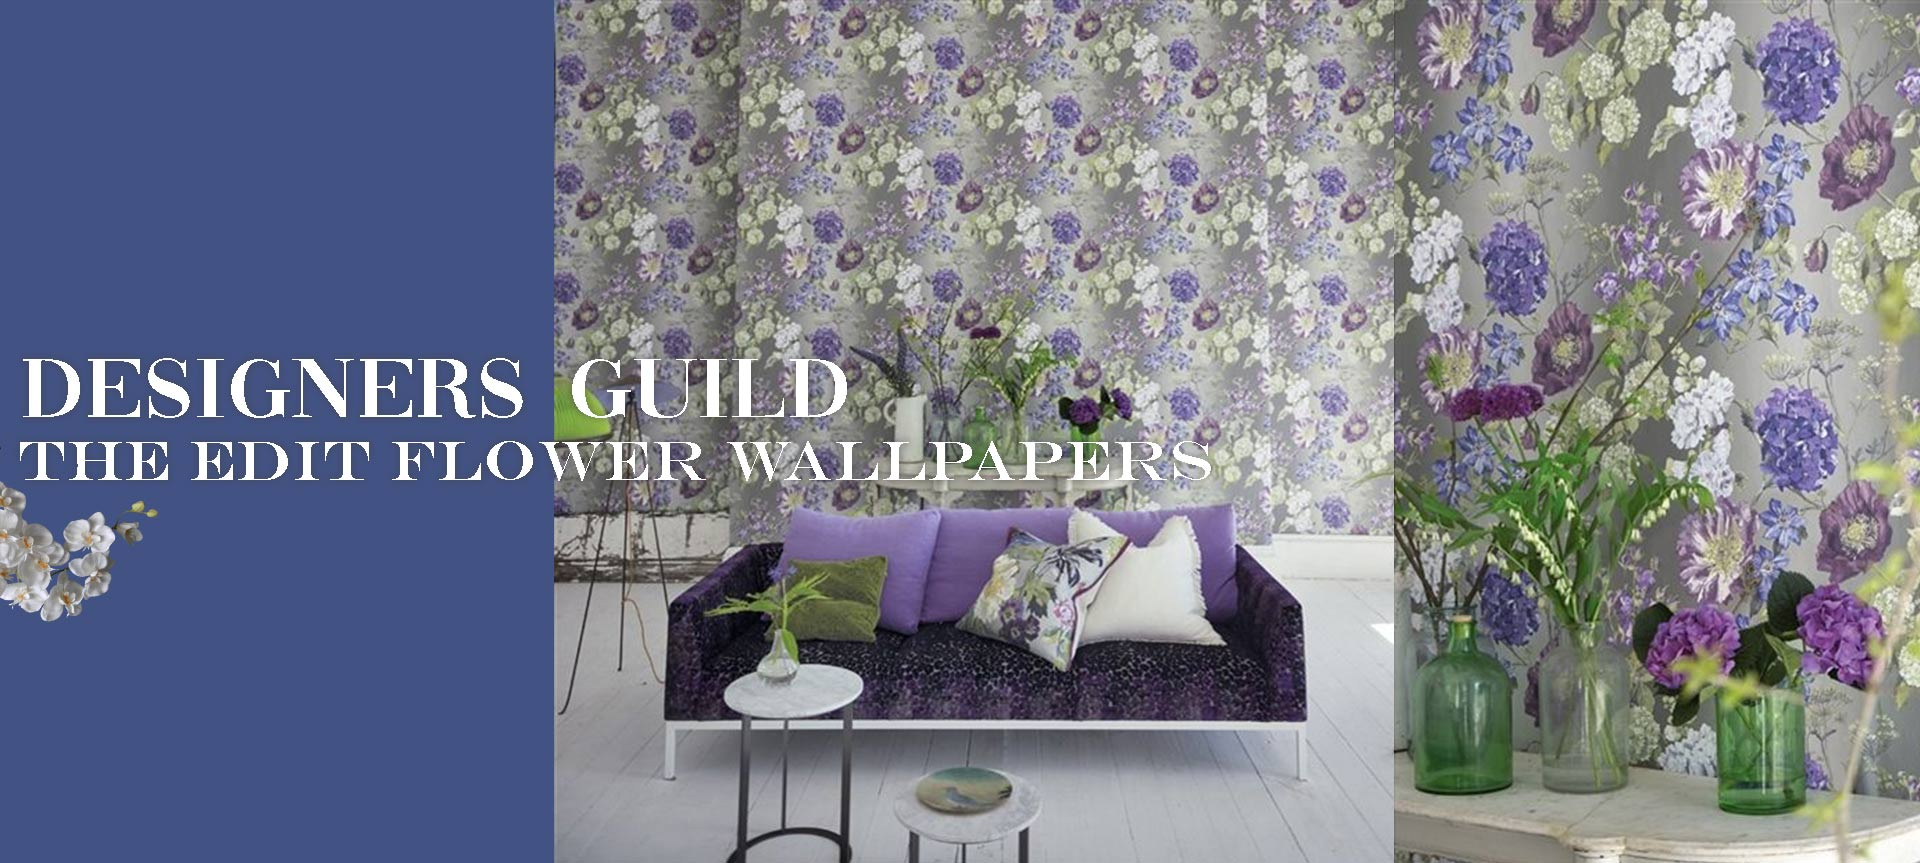 Designers Guild Wallpaper Flower Wallpapers